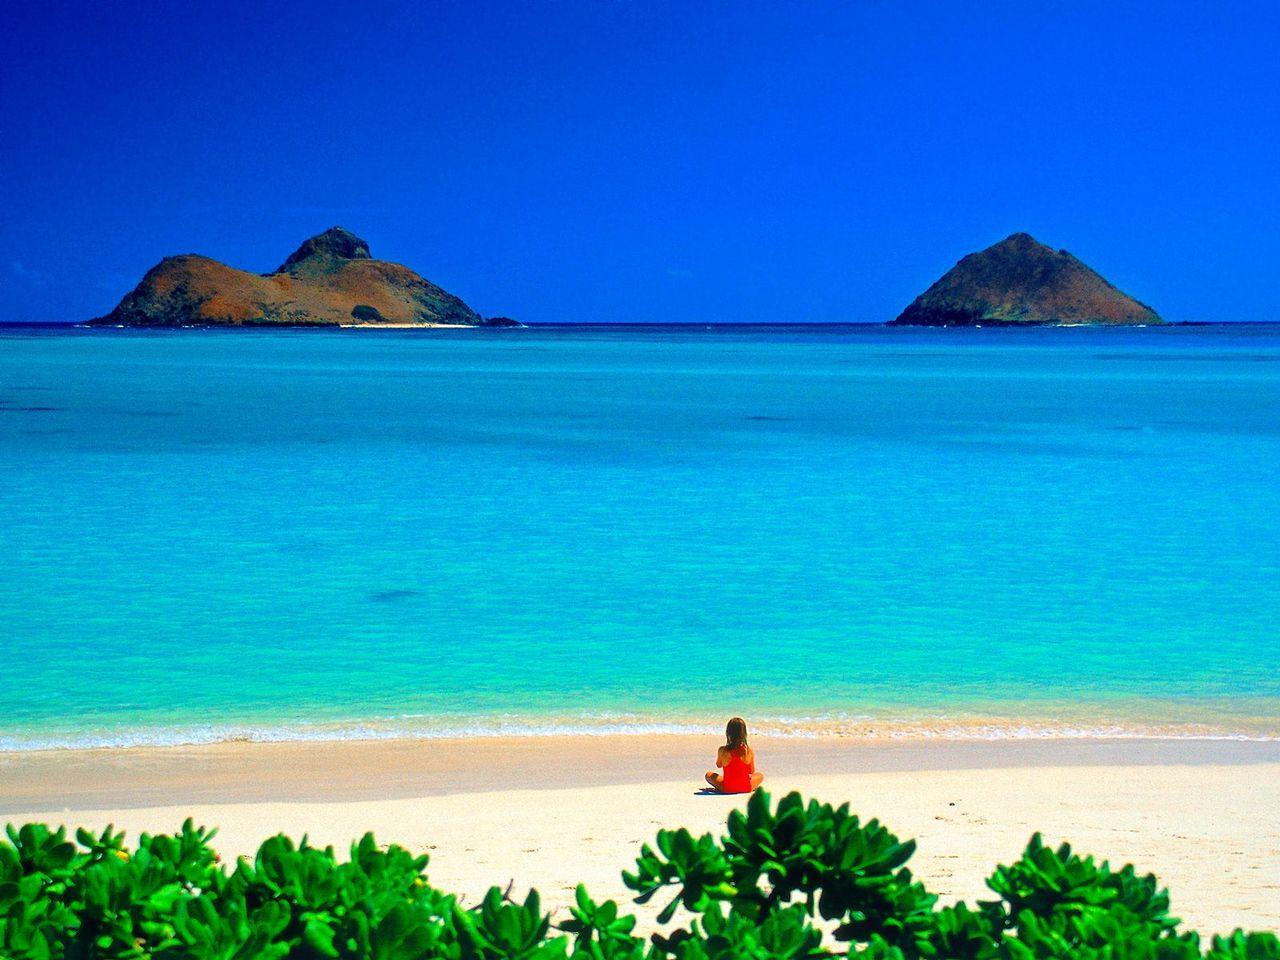 hawaii 卵子提供 さて、弊社では、卵子提供プログラムをタイとハワイでご提供しております。今